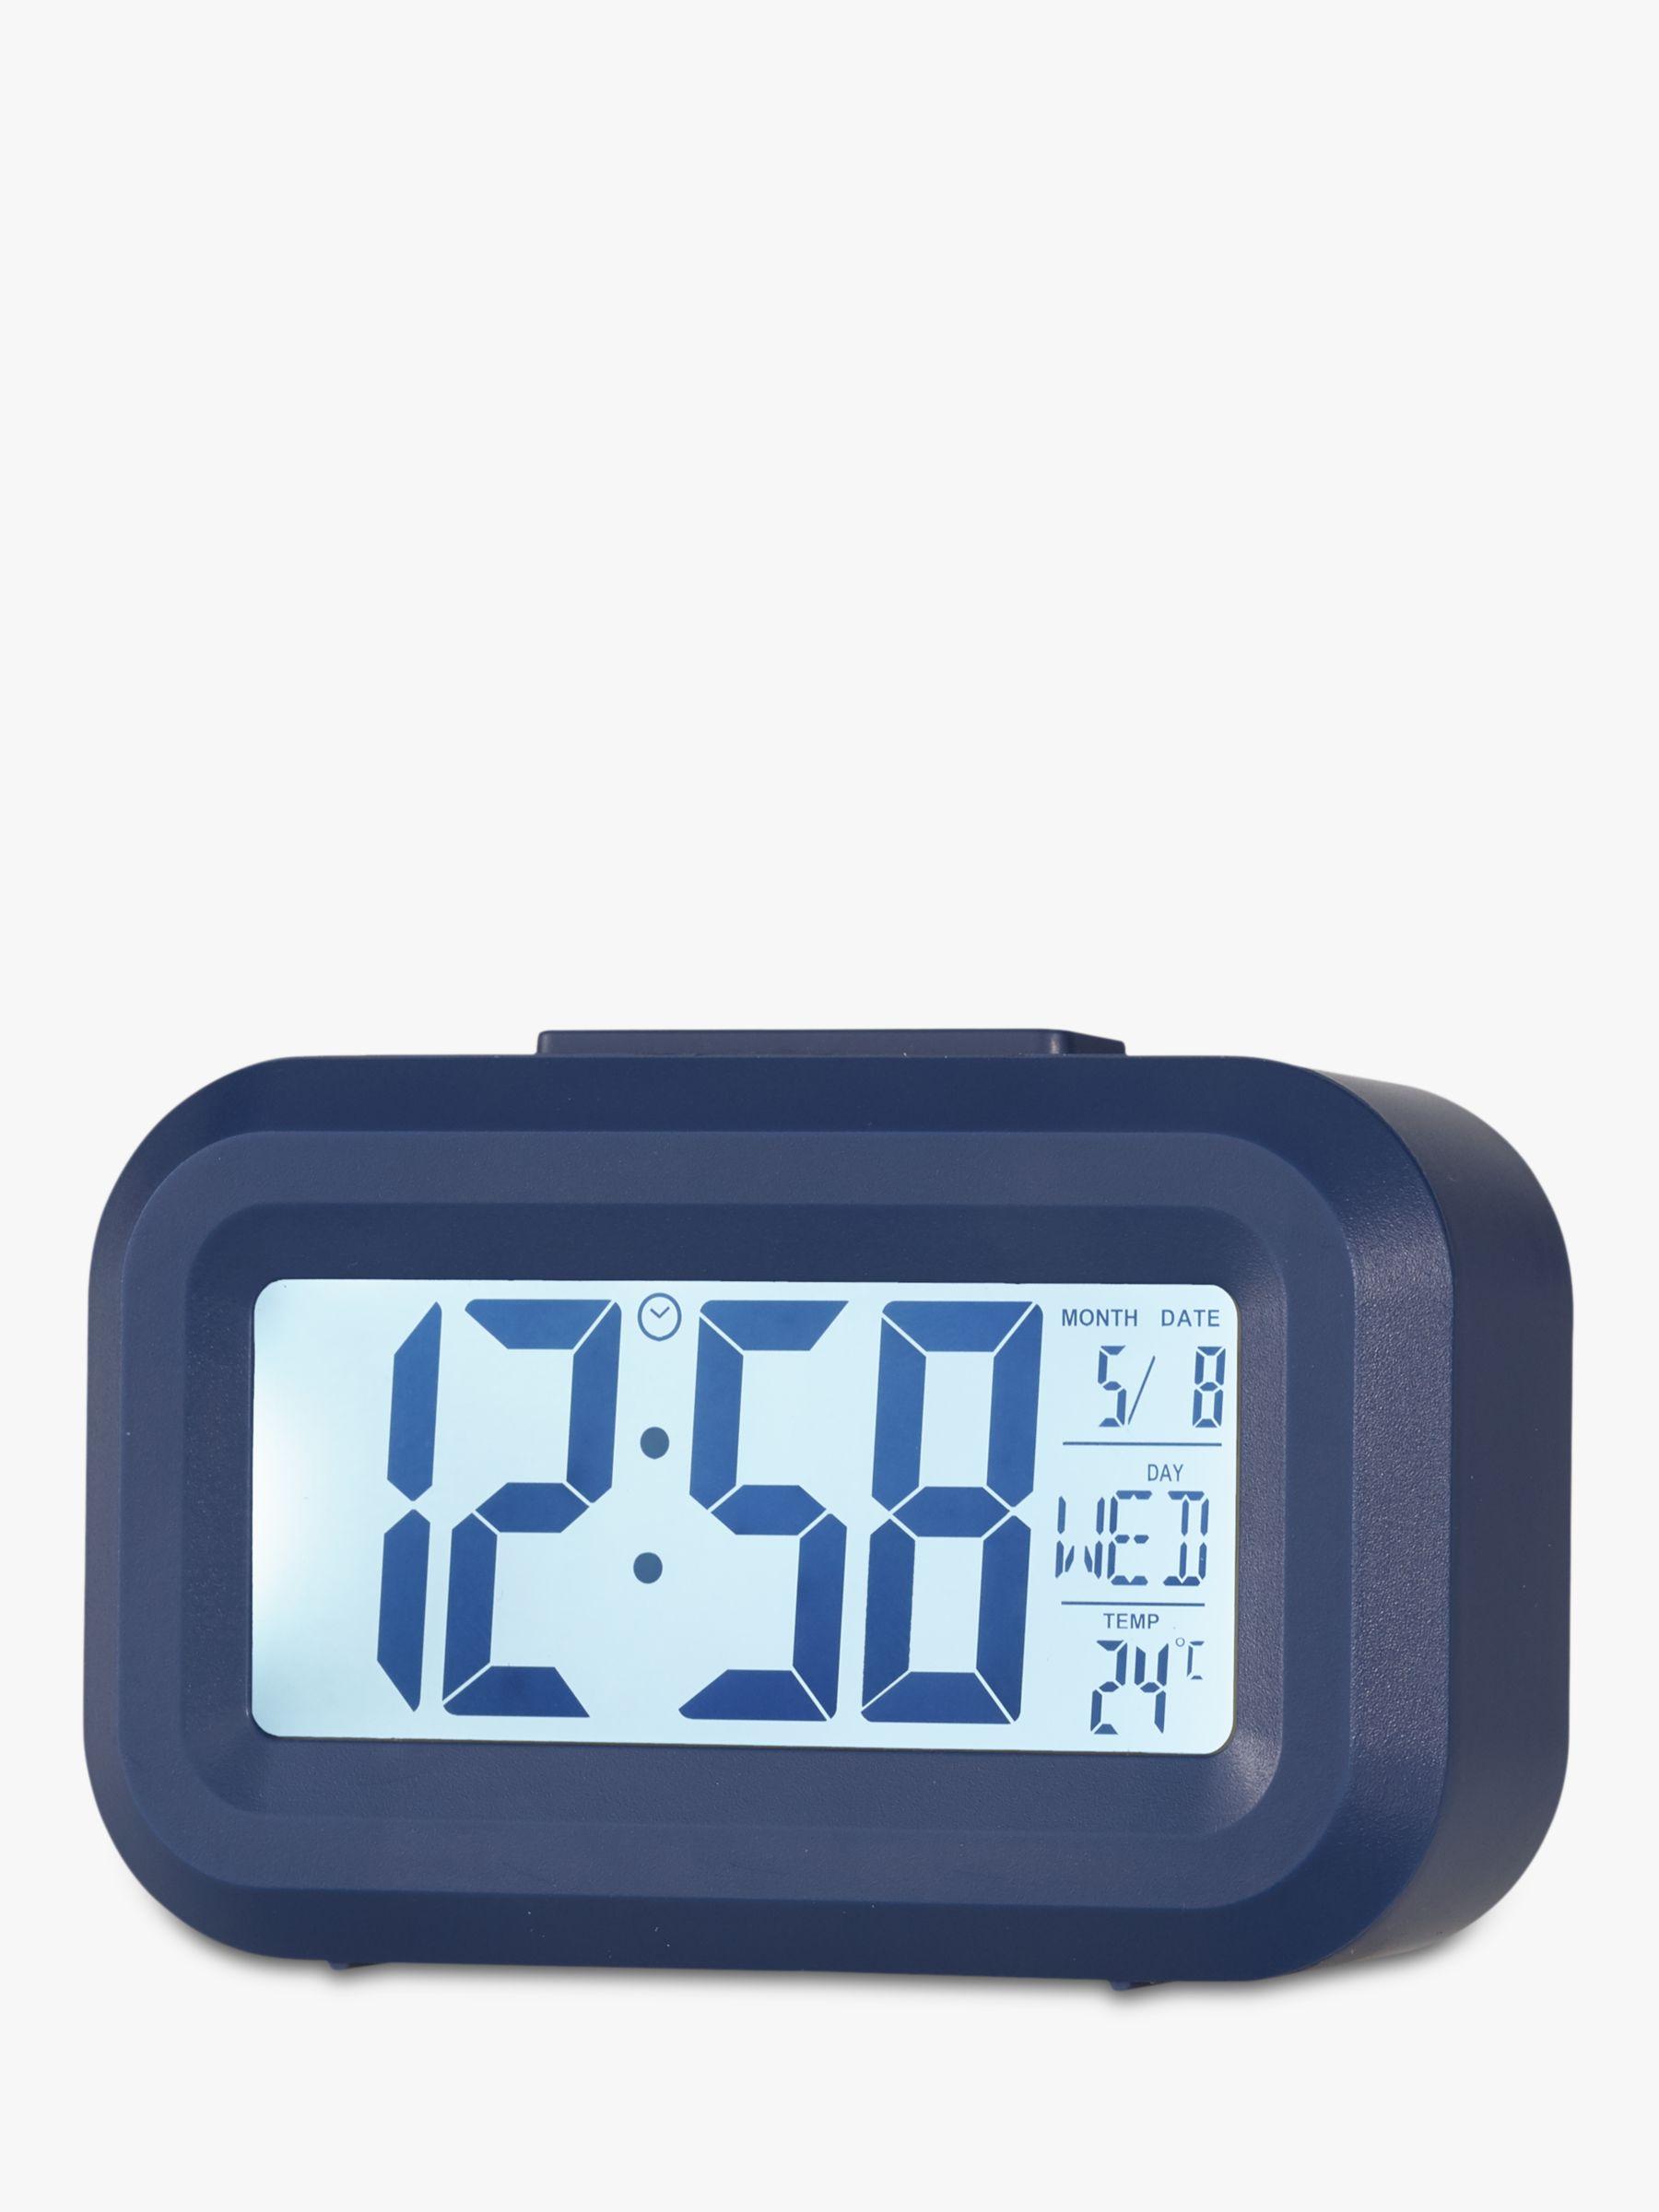 Acctim Acctim Jago LCD Digital Alarm Clock